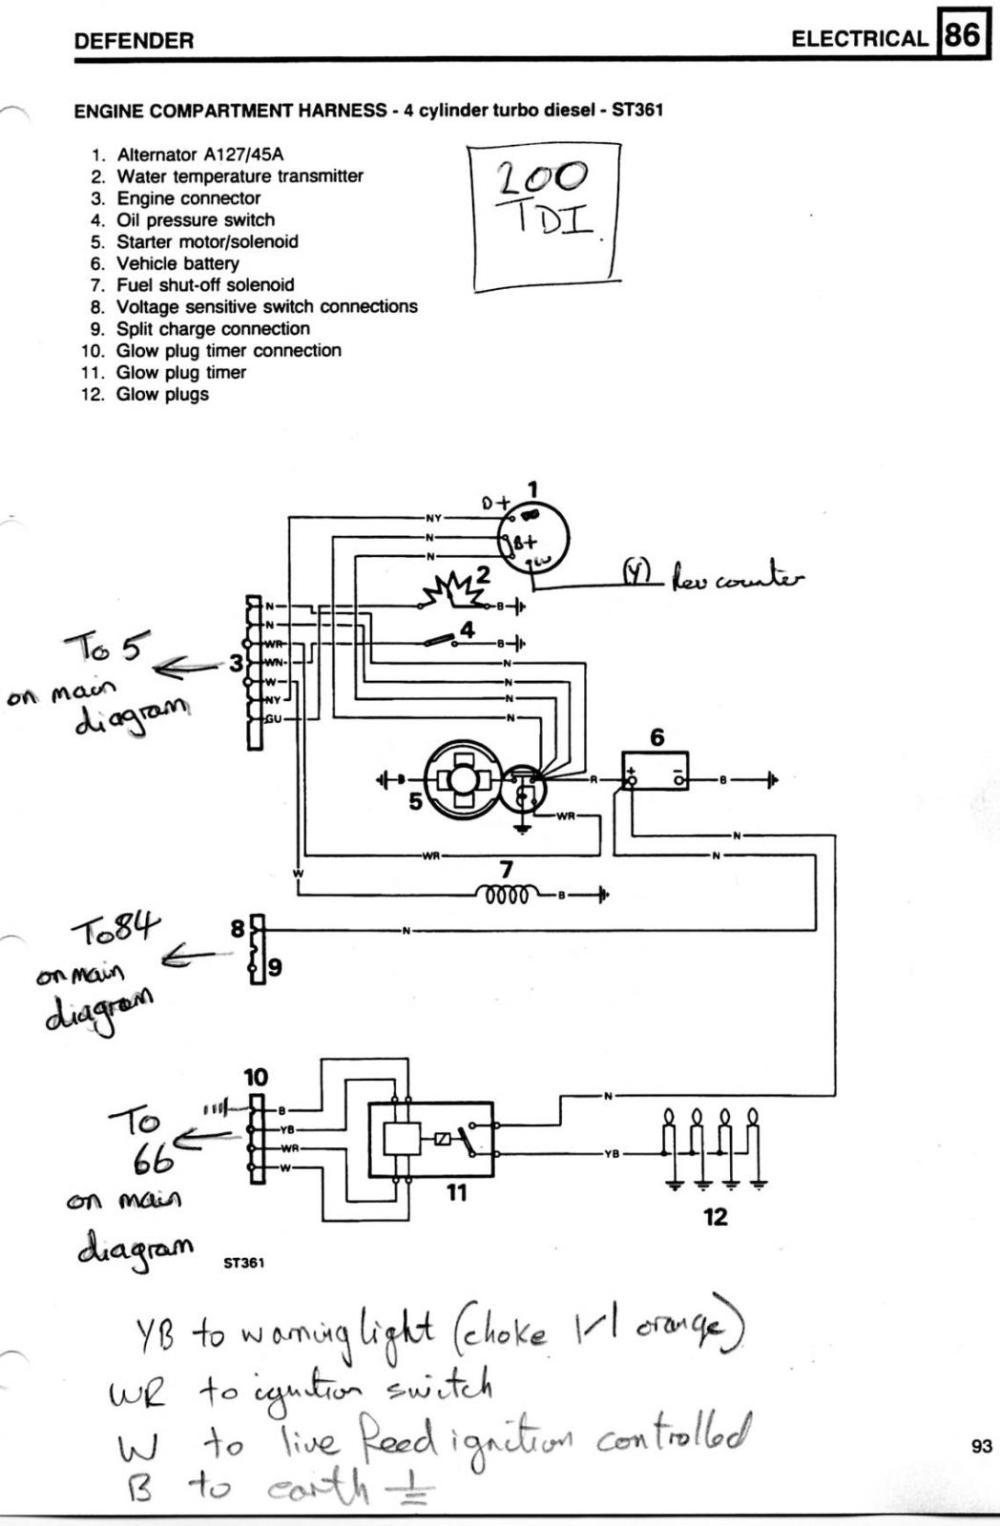 medium resolution of defender wiring defender forum lr4x4 the land rover forum defender 110 200 tdi engine wiring diagram